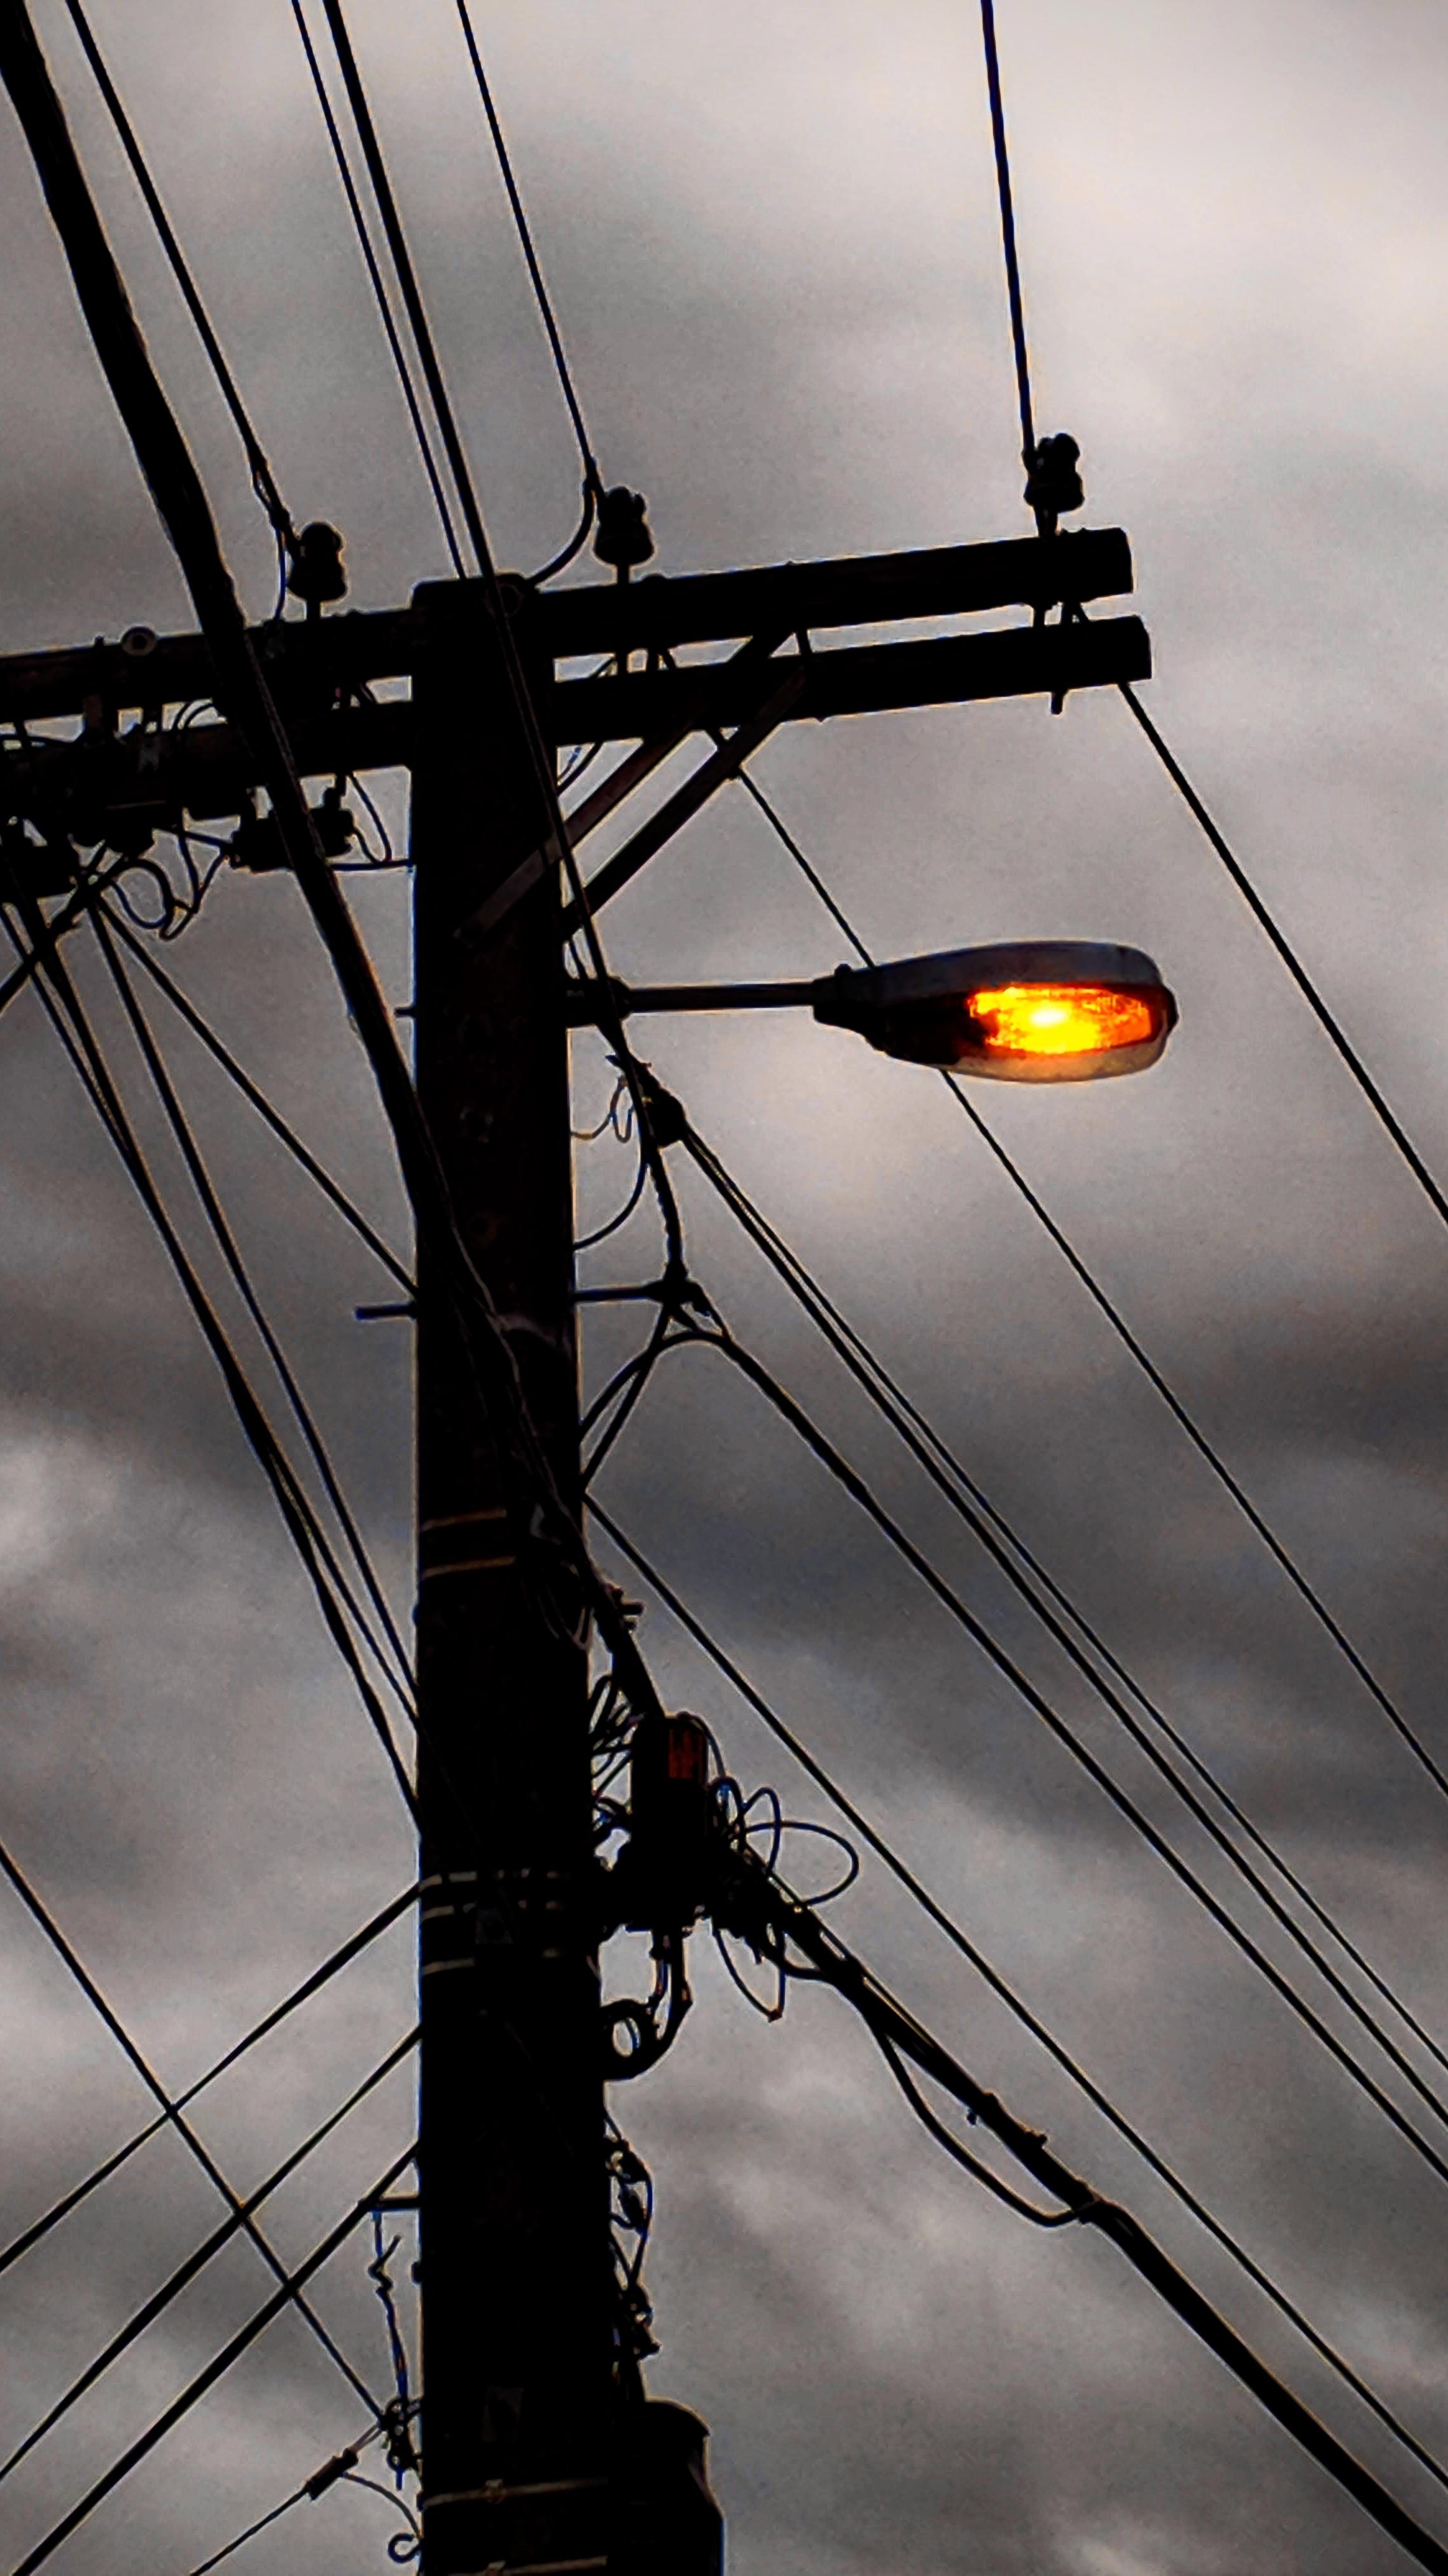 Street light against a dark and stormy sky